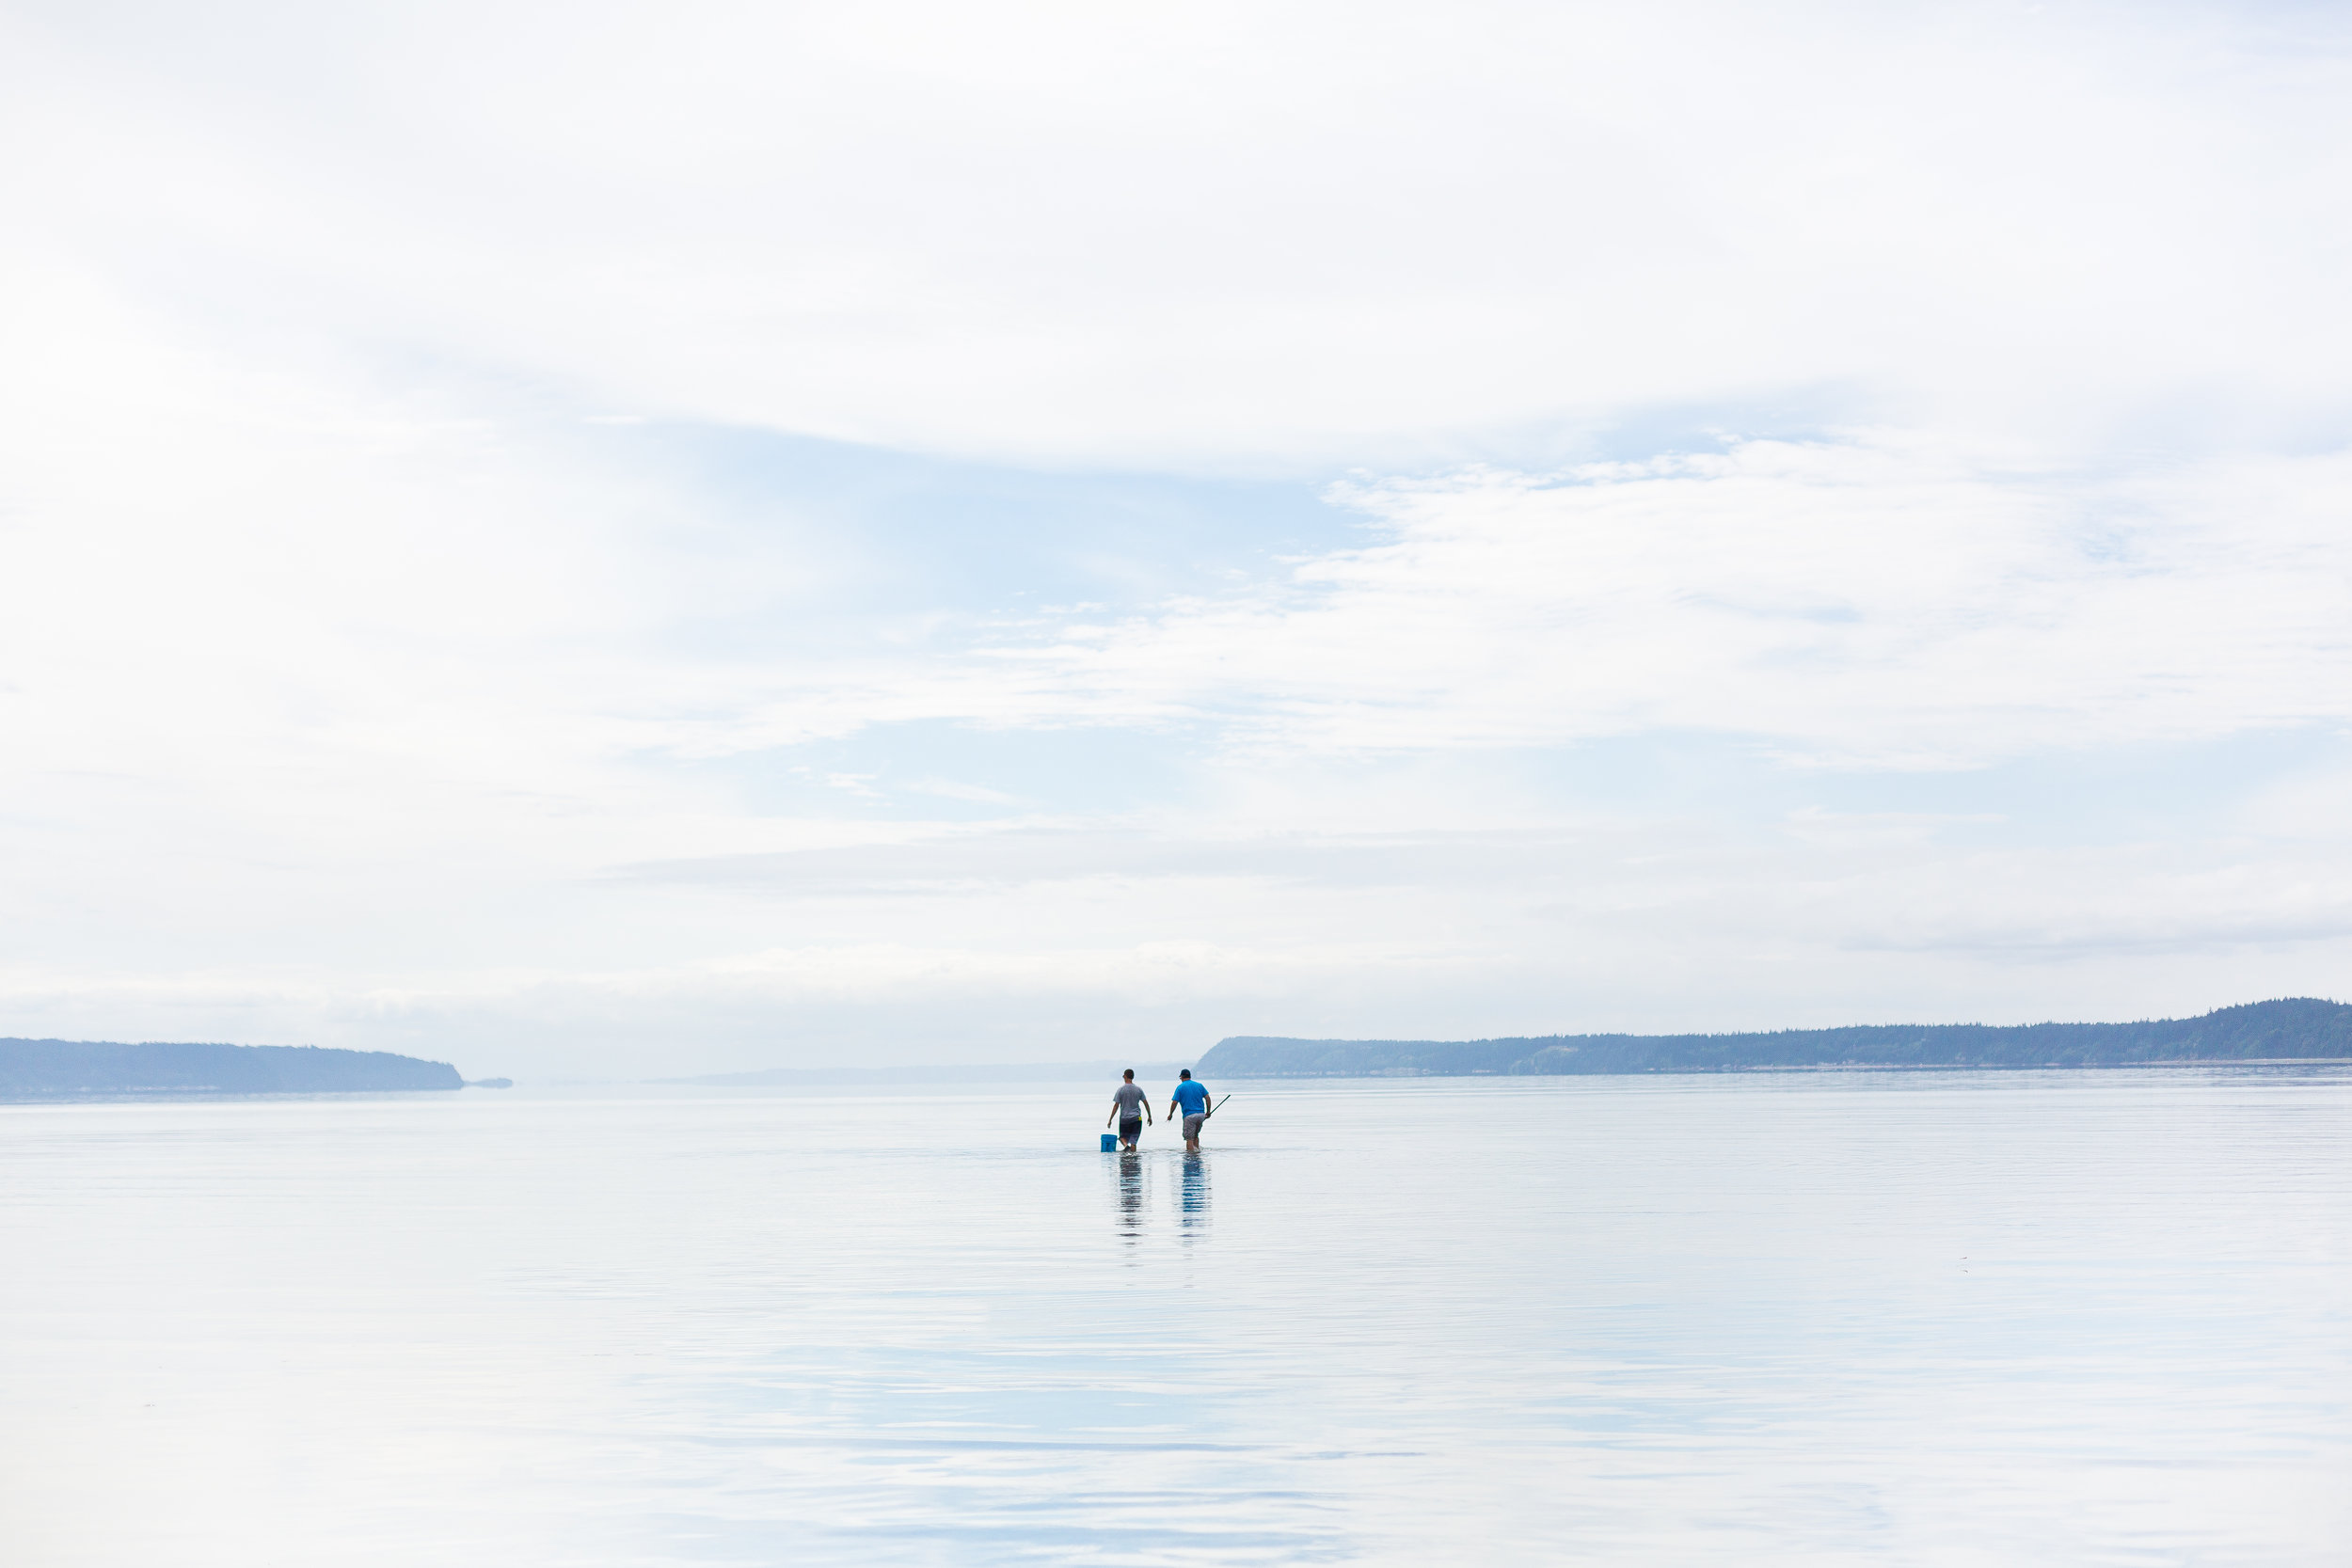 nicole-daacke-photography-oregon-coast-landscapes-elopement-photographer-wedding-photography-adventure-lifestyle-roadtrip-along-oregon-coast-cape-kiwanda-oceanside-beach-cannon-beach-oregon-pnw-22.jpg